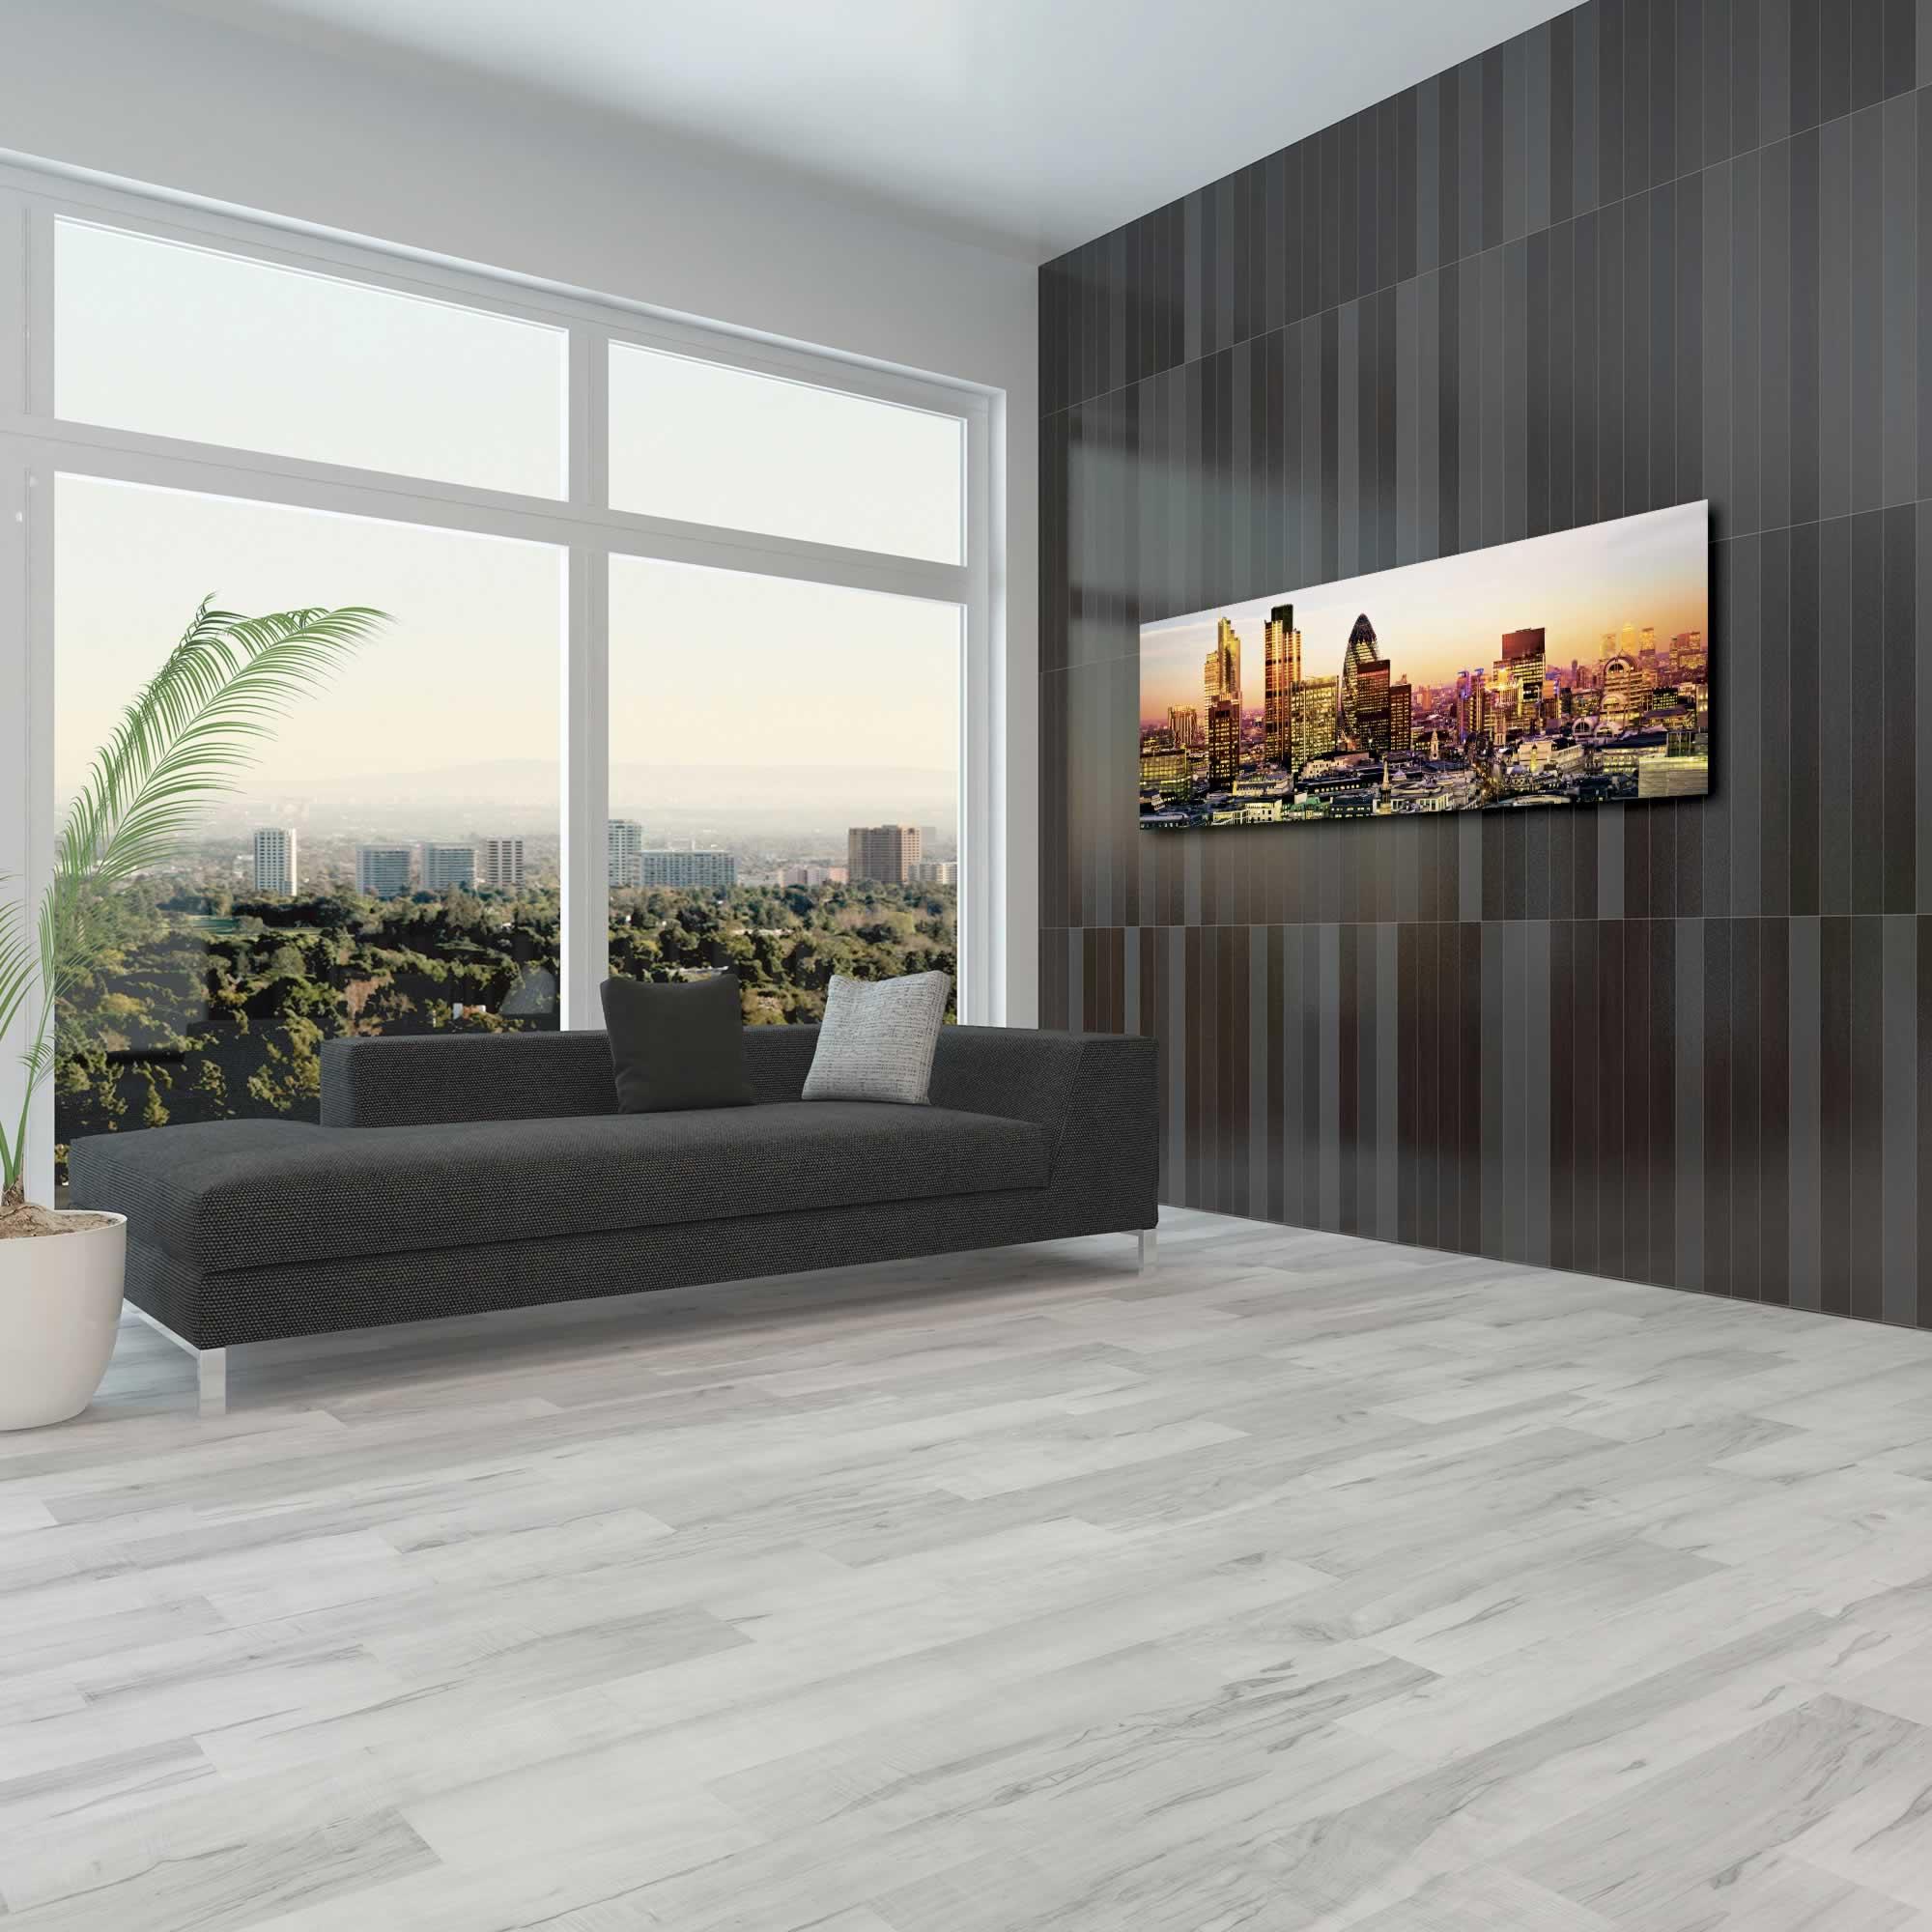 Modern London City Skyline - Urban Modern Art, Designer Home Decor, Cityscape Wall Artwork, Trendy Contemporary Art - Alternate View 3